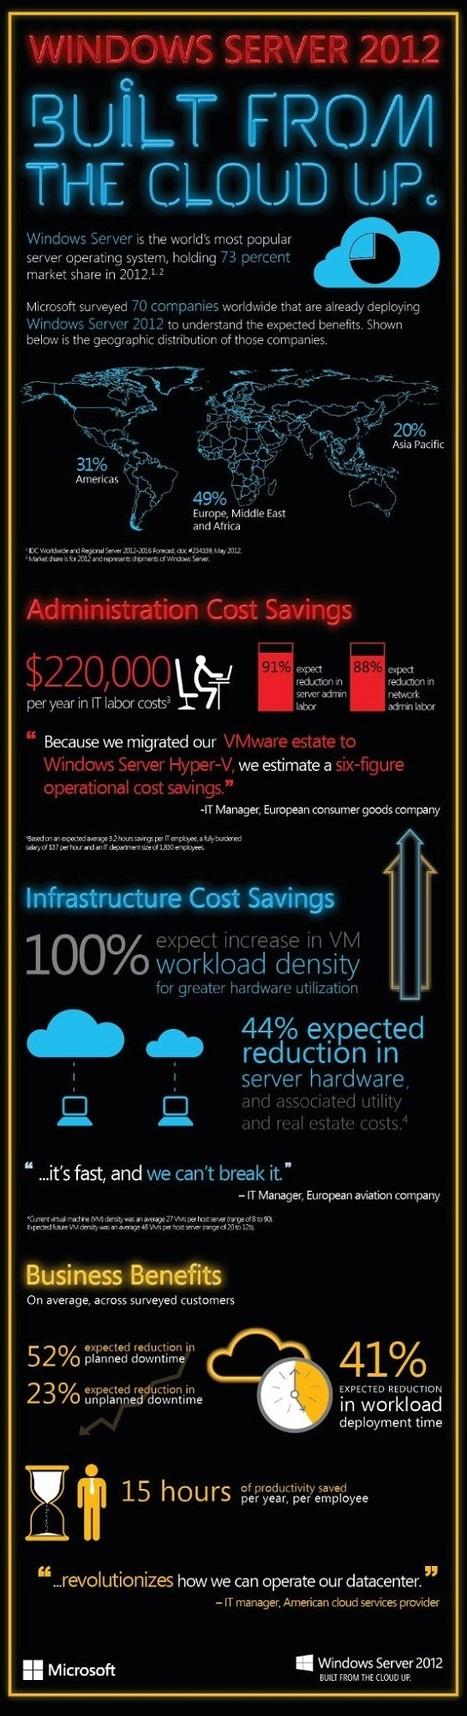 INFOGRAPHIC: Windows Server 2012 Facts and Figures - Microsoft Server and Cloud Platform Blog | Cultura de massa no Século XXI (Mass Culture in the XXI Century) | Scoop.it